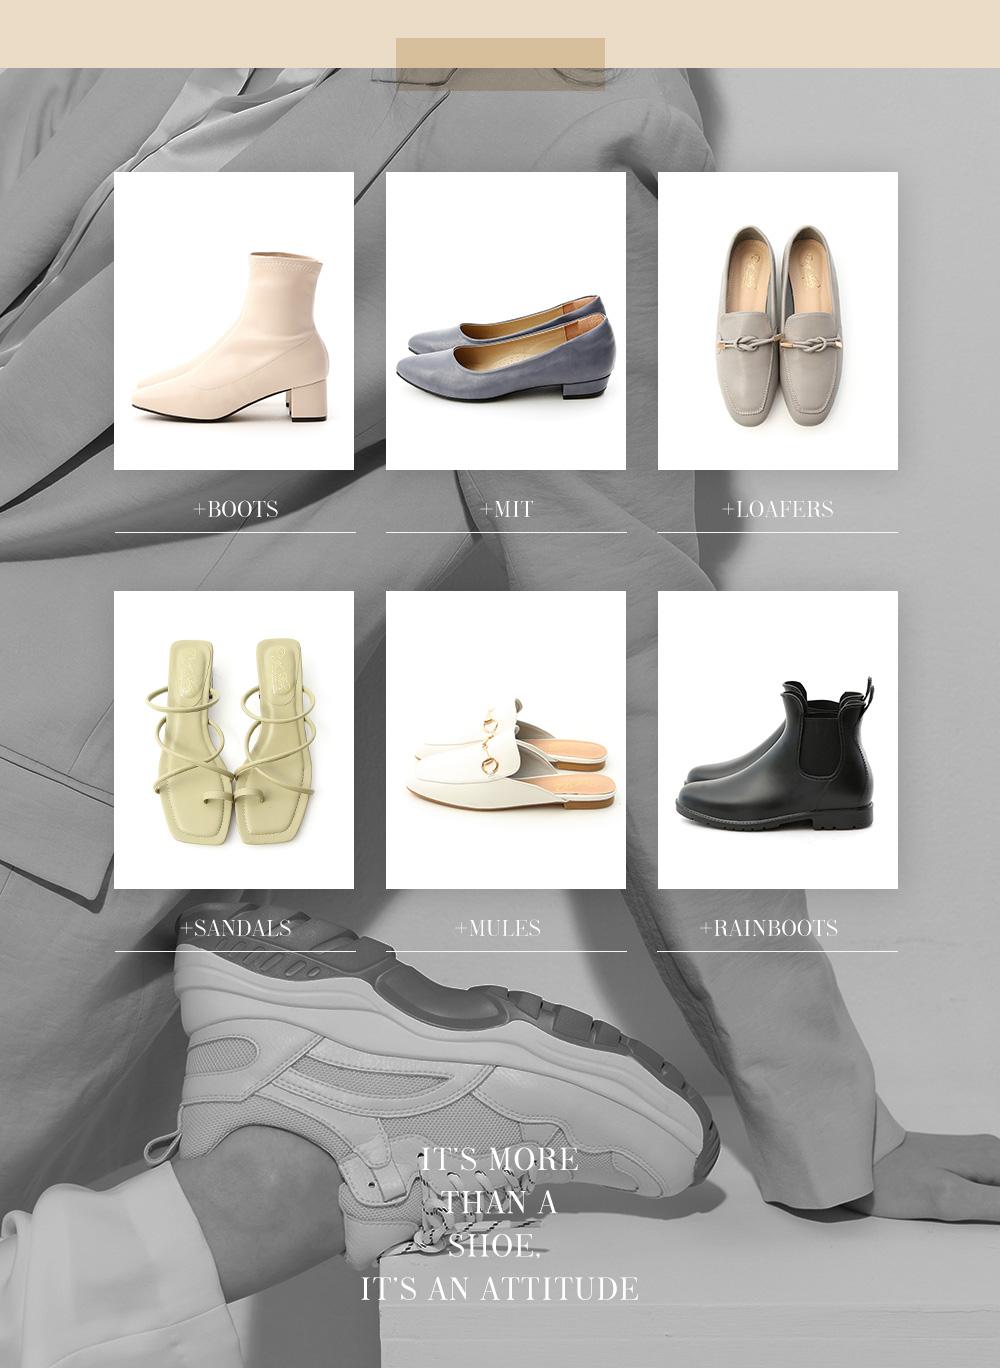 D+AF人氣熱銷鞋款 豆豆鞋 樂福鞋 牛津鞋 帆布鞋 高跟鞋 穆勒鞋 涼鞋